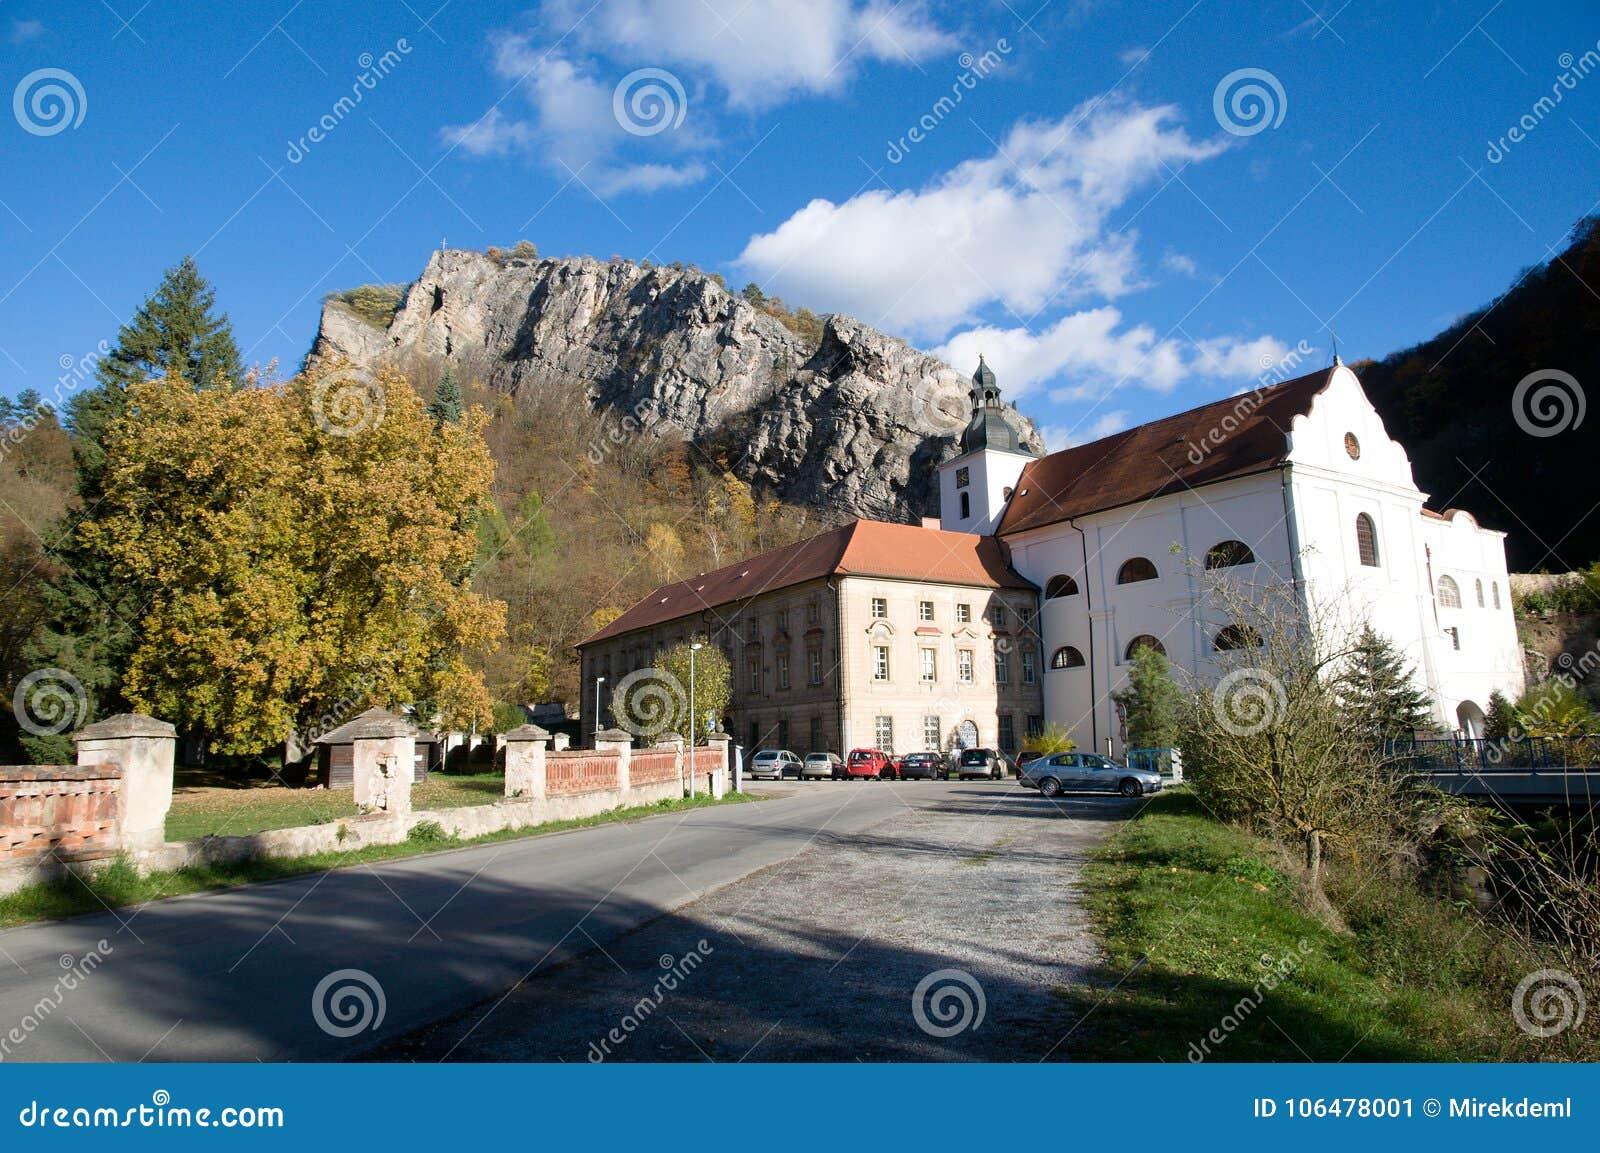 Svaty Jan pod Skalou, Central Bohemia, Czech republic